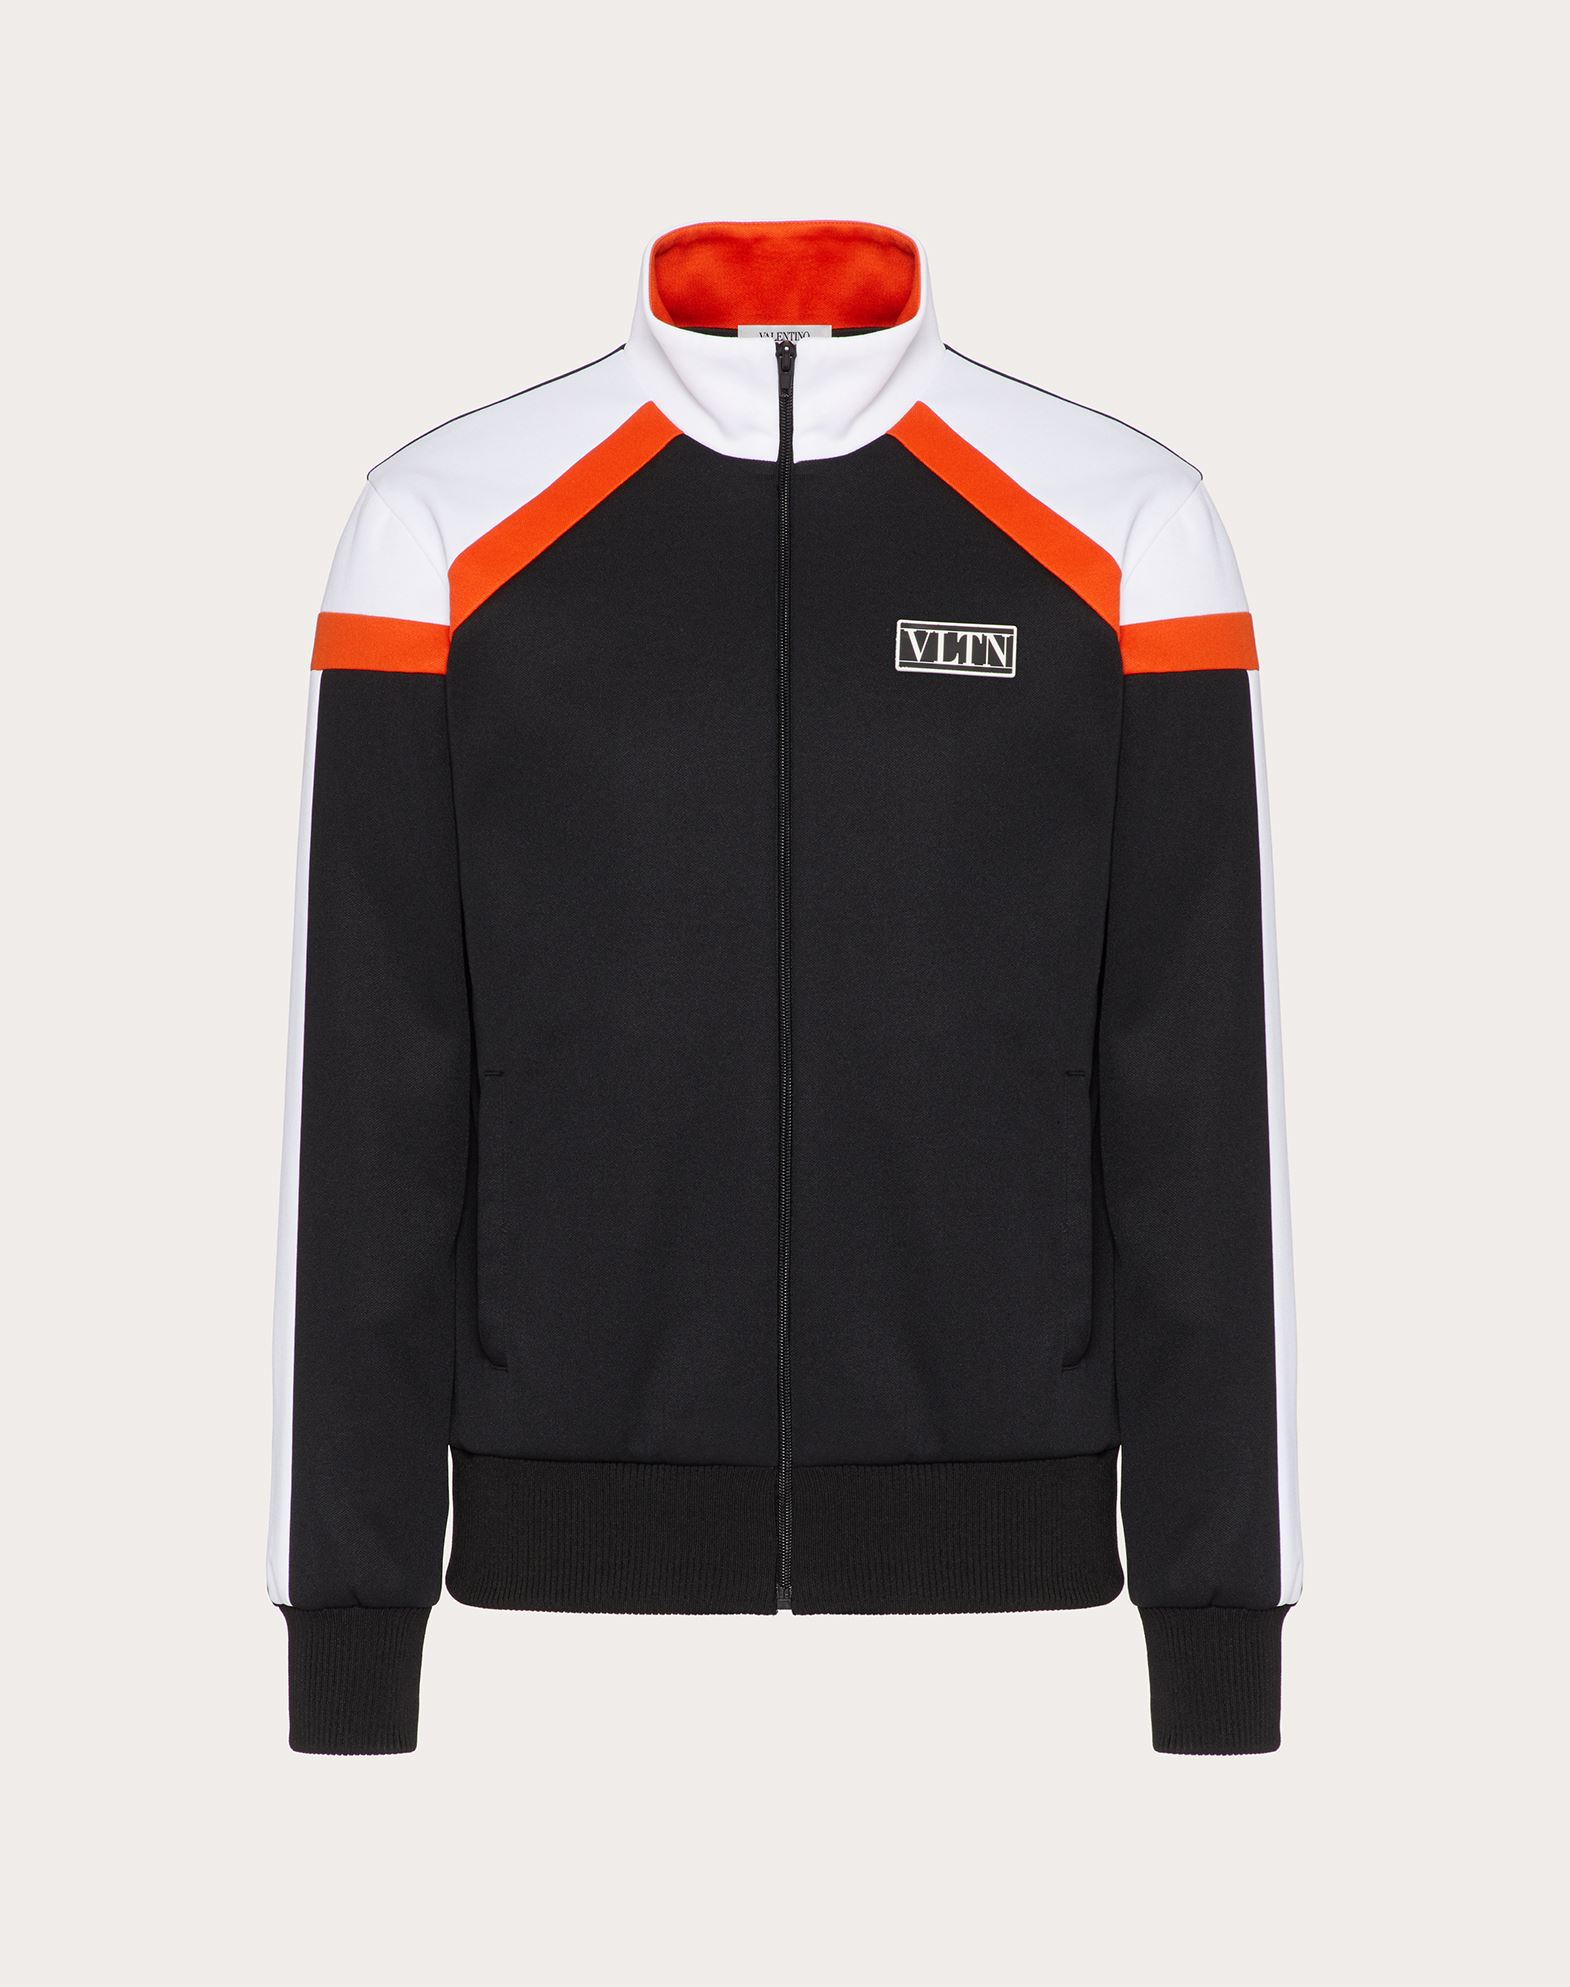 Valentino Uomo Technical Cotton Sweatshirt With Vltn Tag Color Block In Black/neon Orange